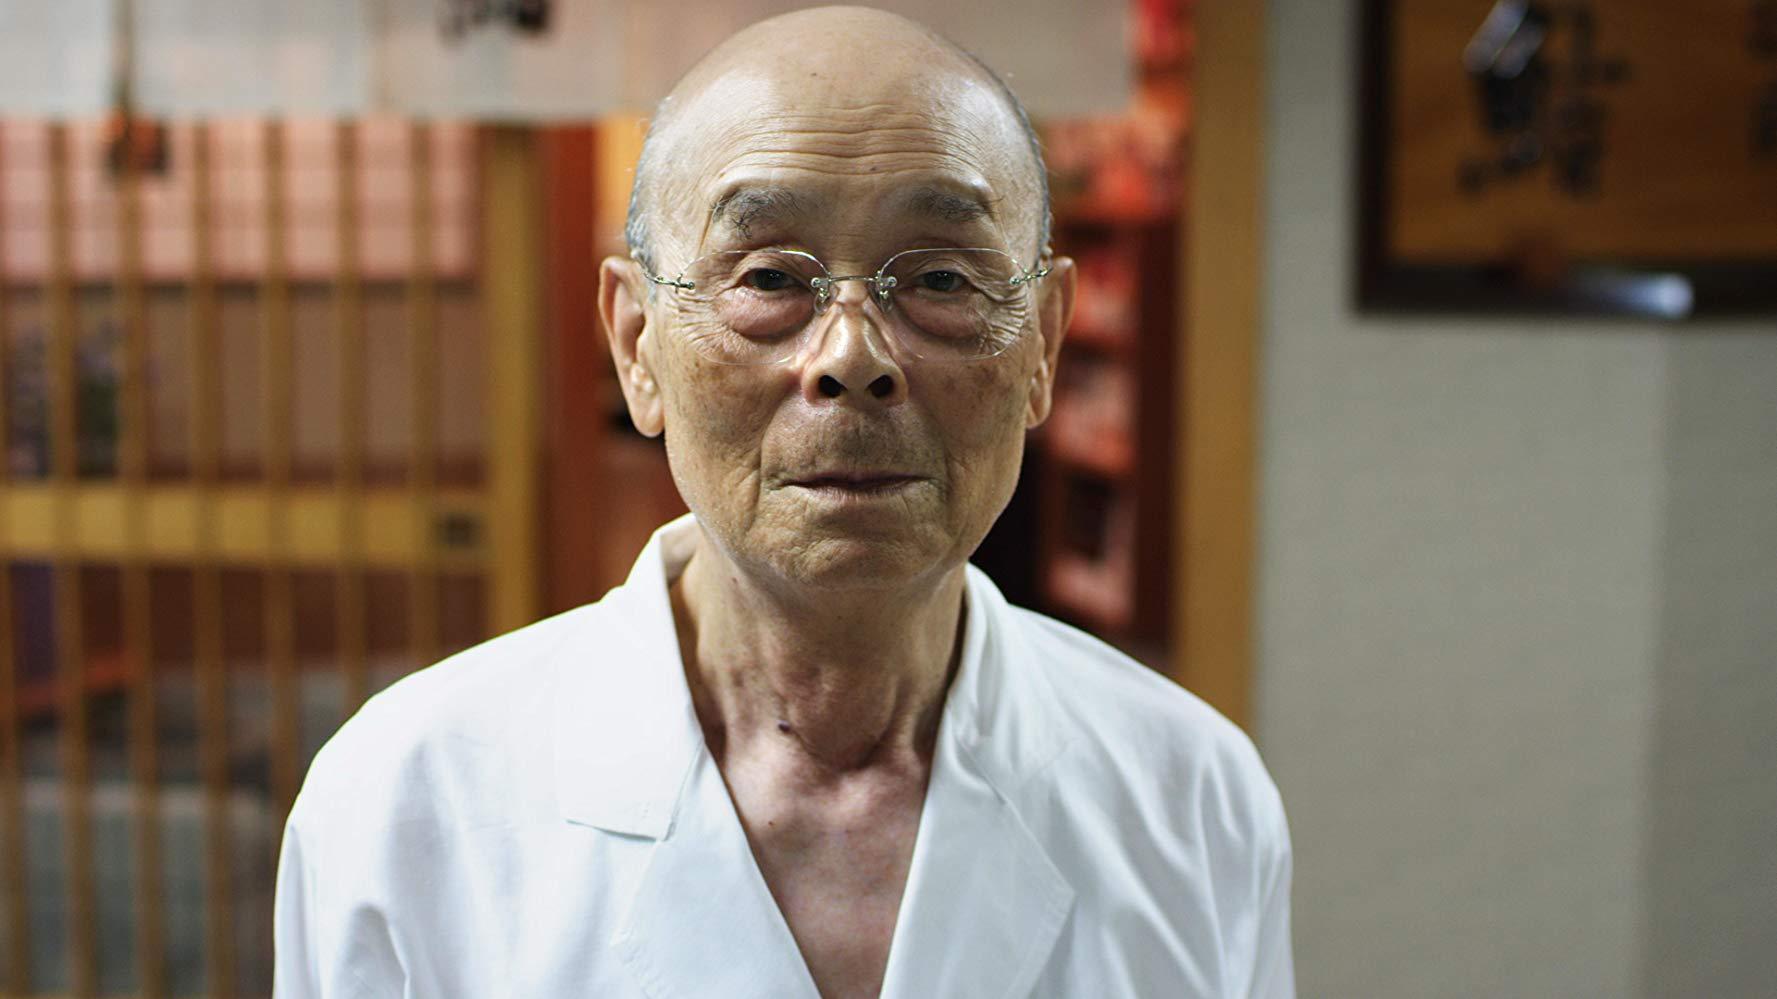 مشاهدة فيلم Jiro Dreams Of Sushi 2011 HD مترجم كامل اون لاين